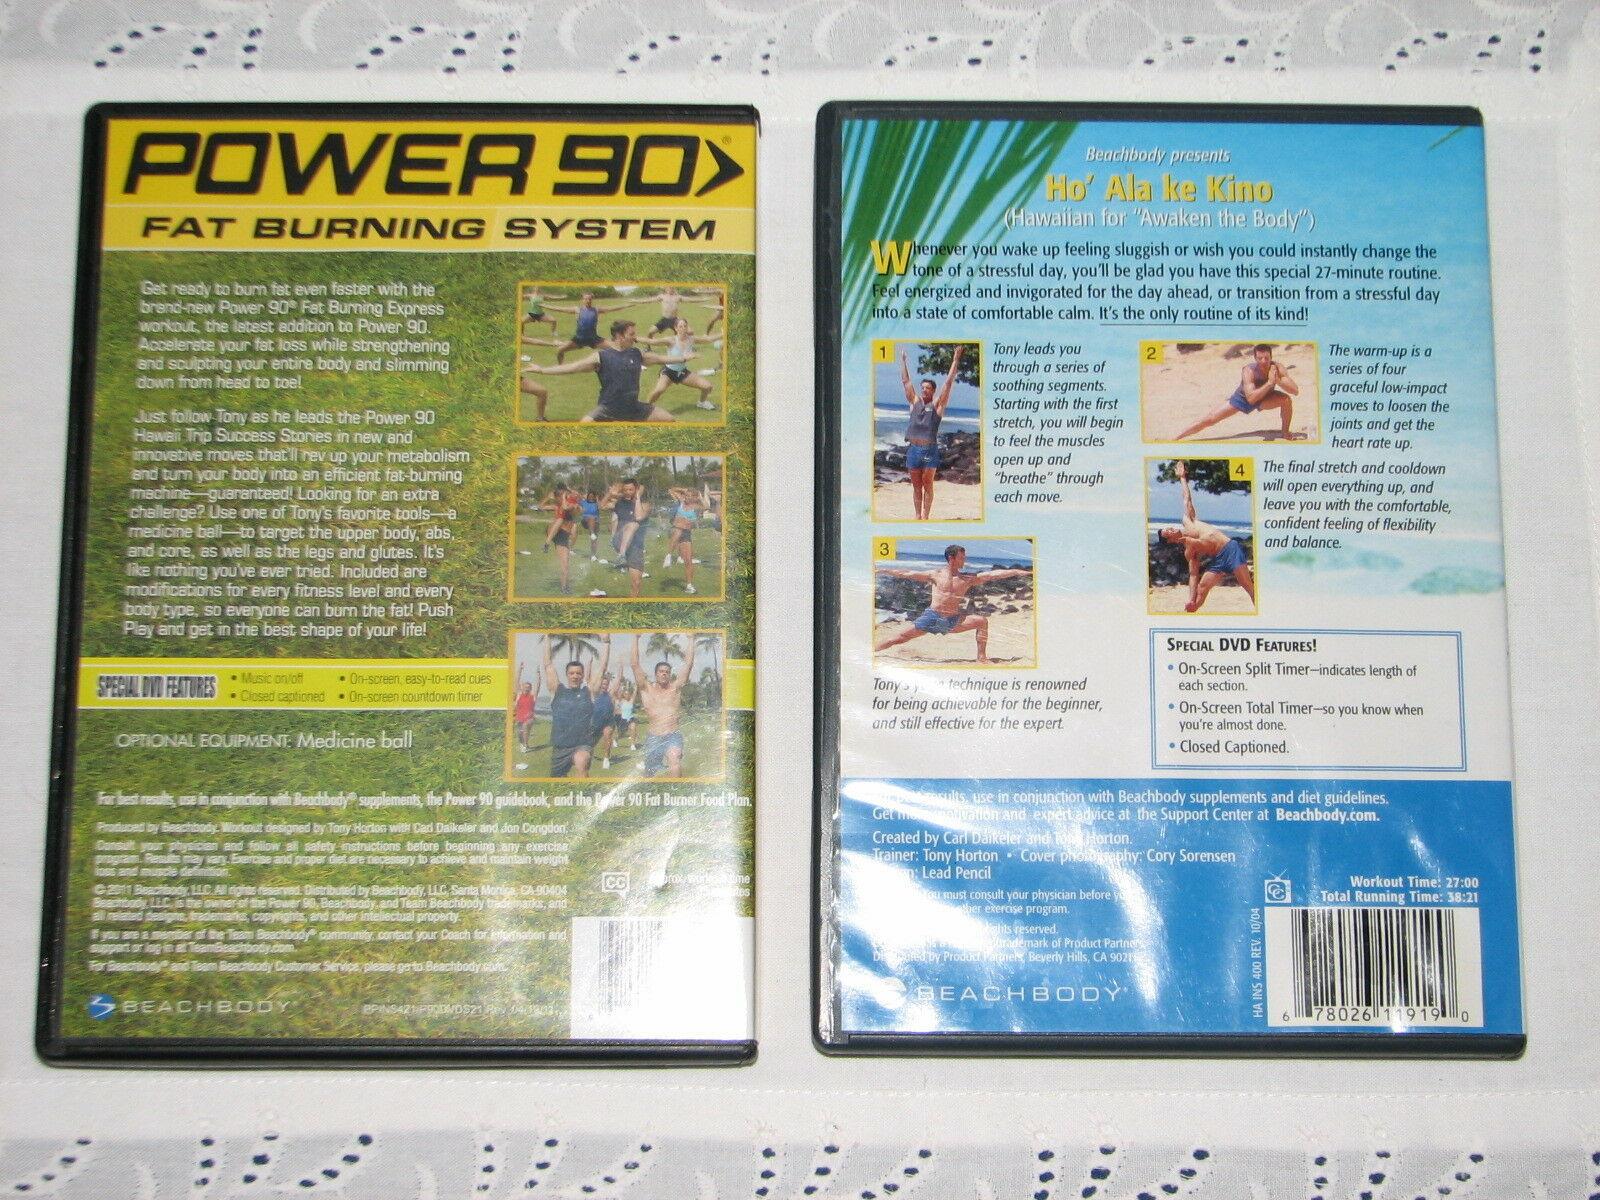 Two Tony Horton DVD's POWER 90 FAT BURNING SYSTEM HO'ALAKE KINO AWAKEN THE BODY image 2